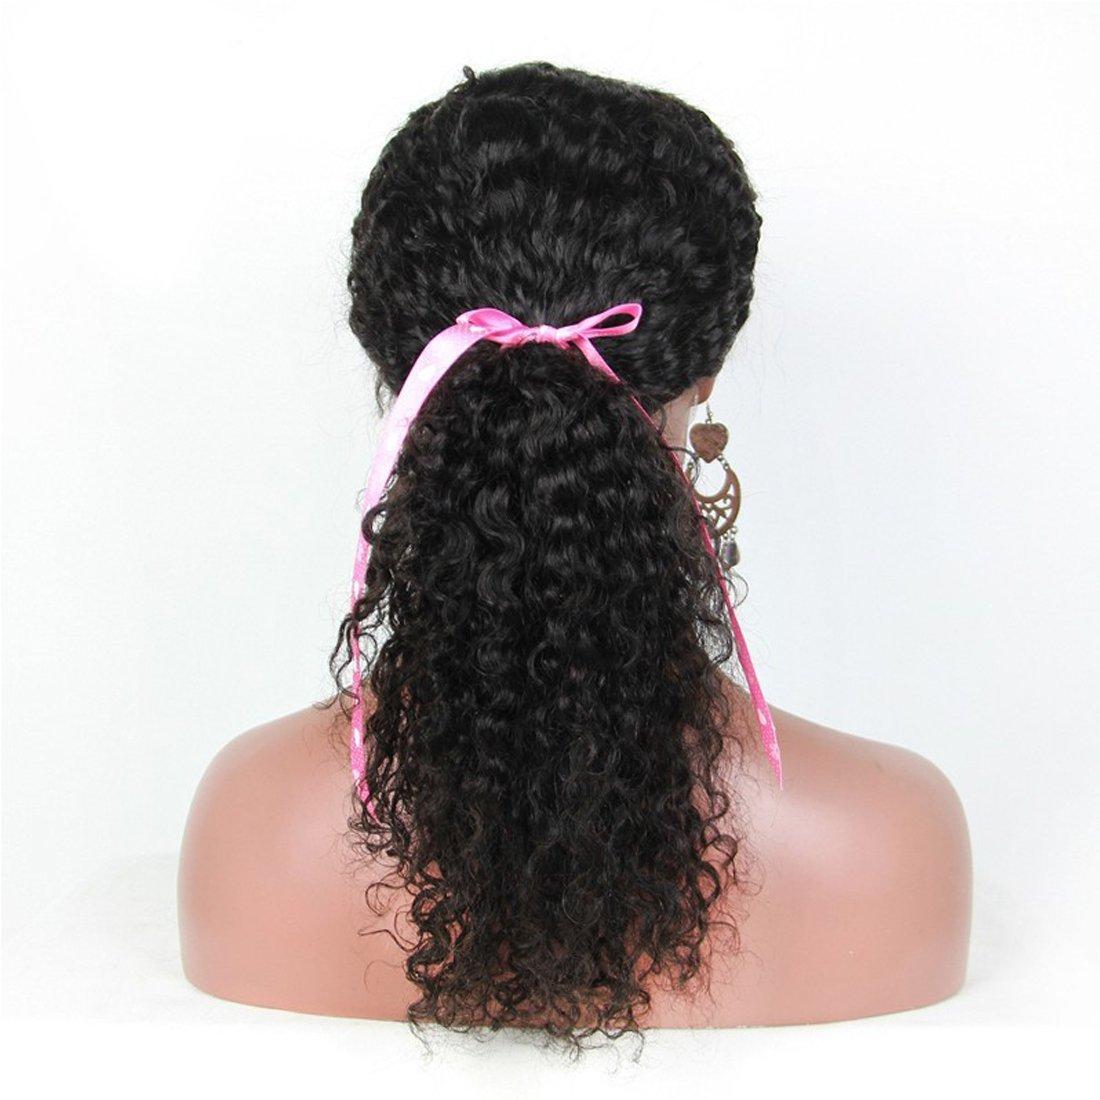 Echo Beauty Top 8A Peruvian Virgin Human Hair Lace Front Wigs for Black Women Curly Wave Handmade Human Hair Wigs Natural Color Medium Cap 20''